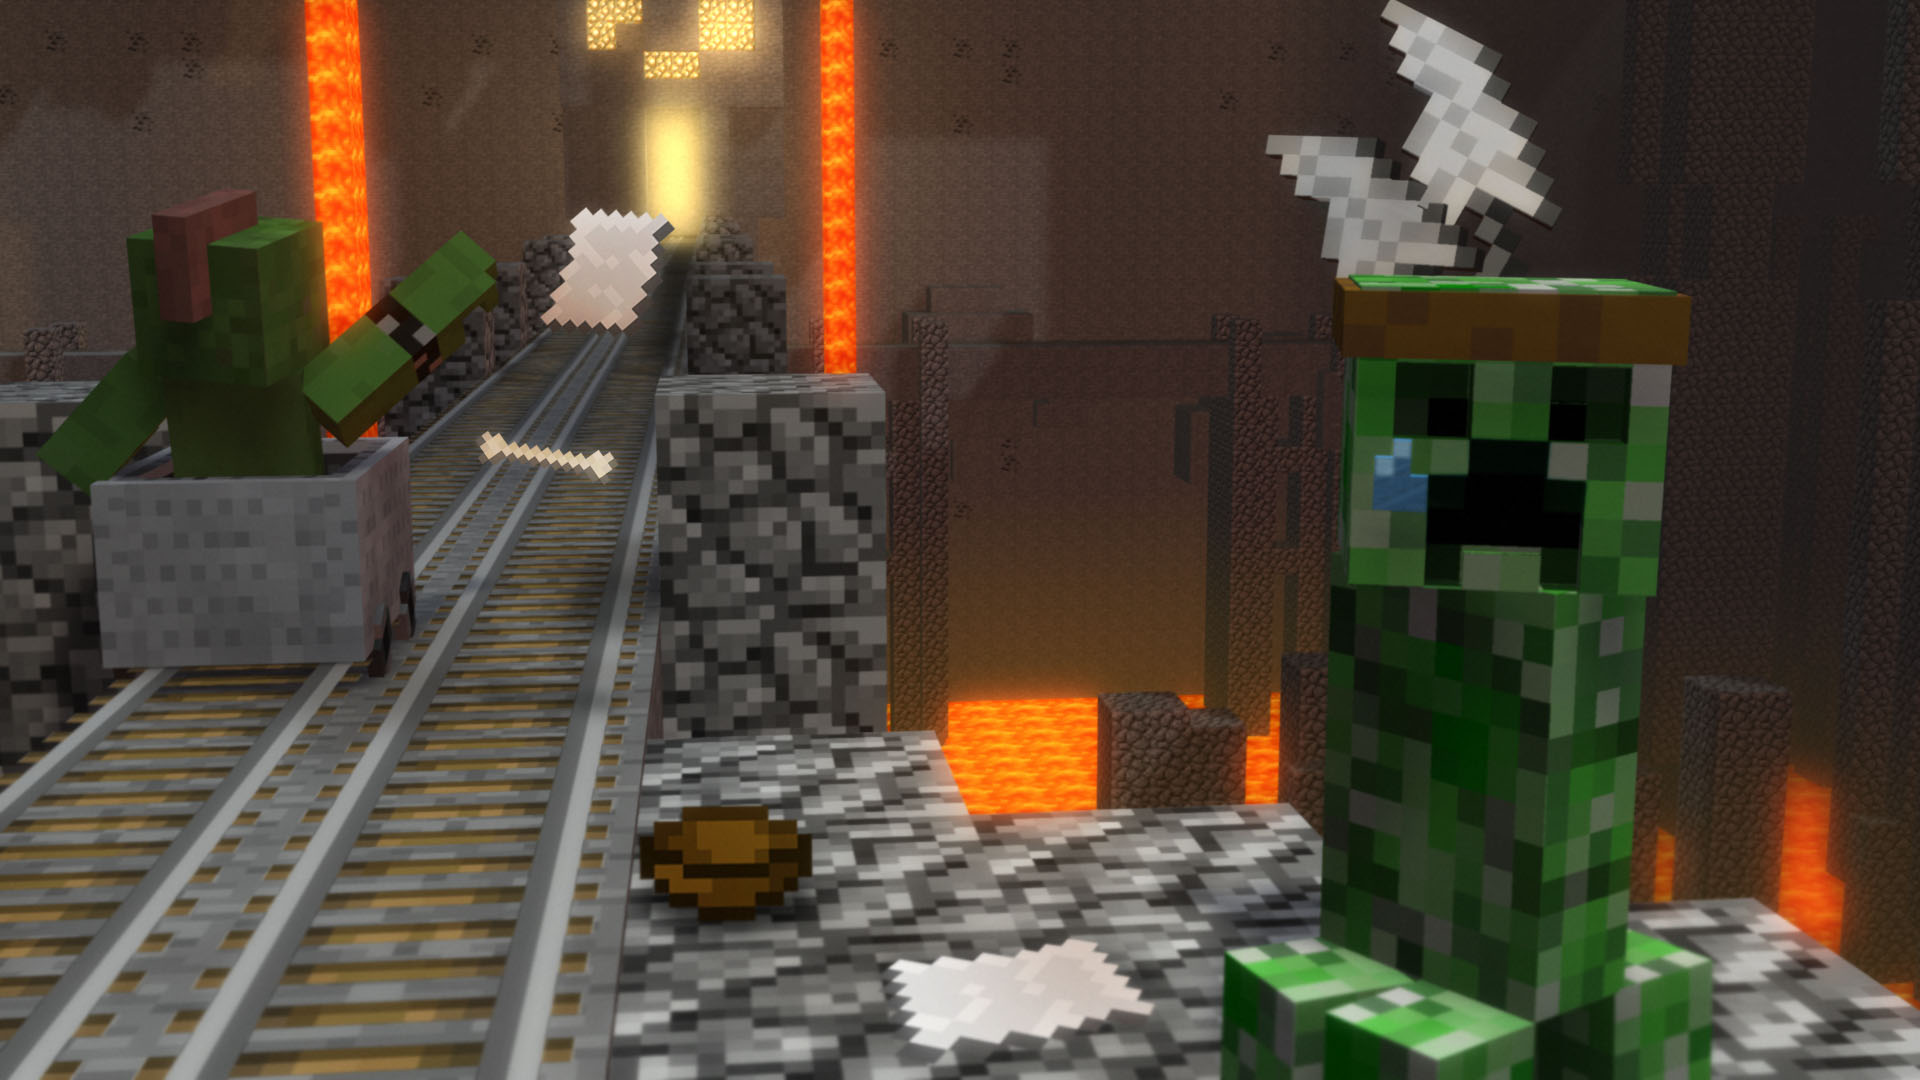 Minecraft Fond d'écran Minecraft - Fond D'ecran Minecraft